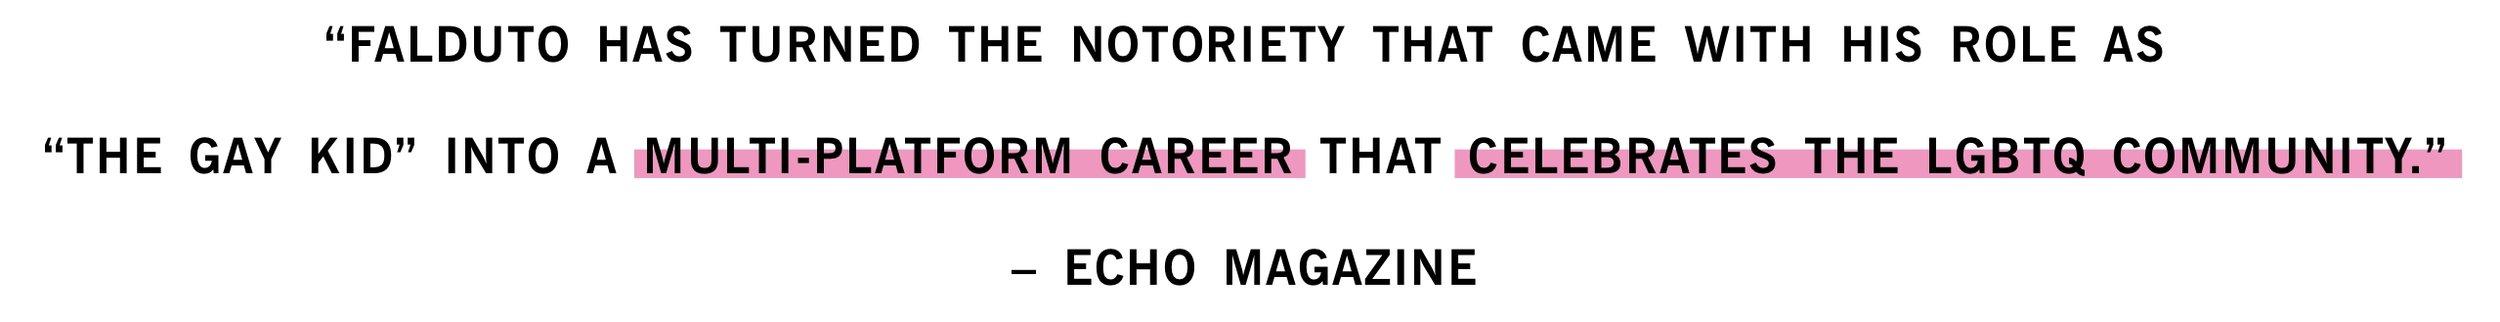 Echo Magazine Quote.jpg